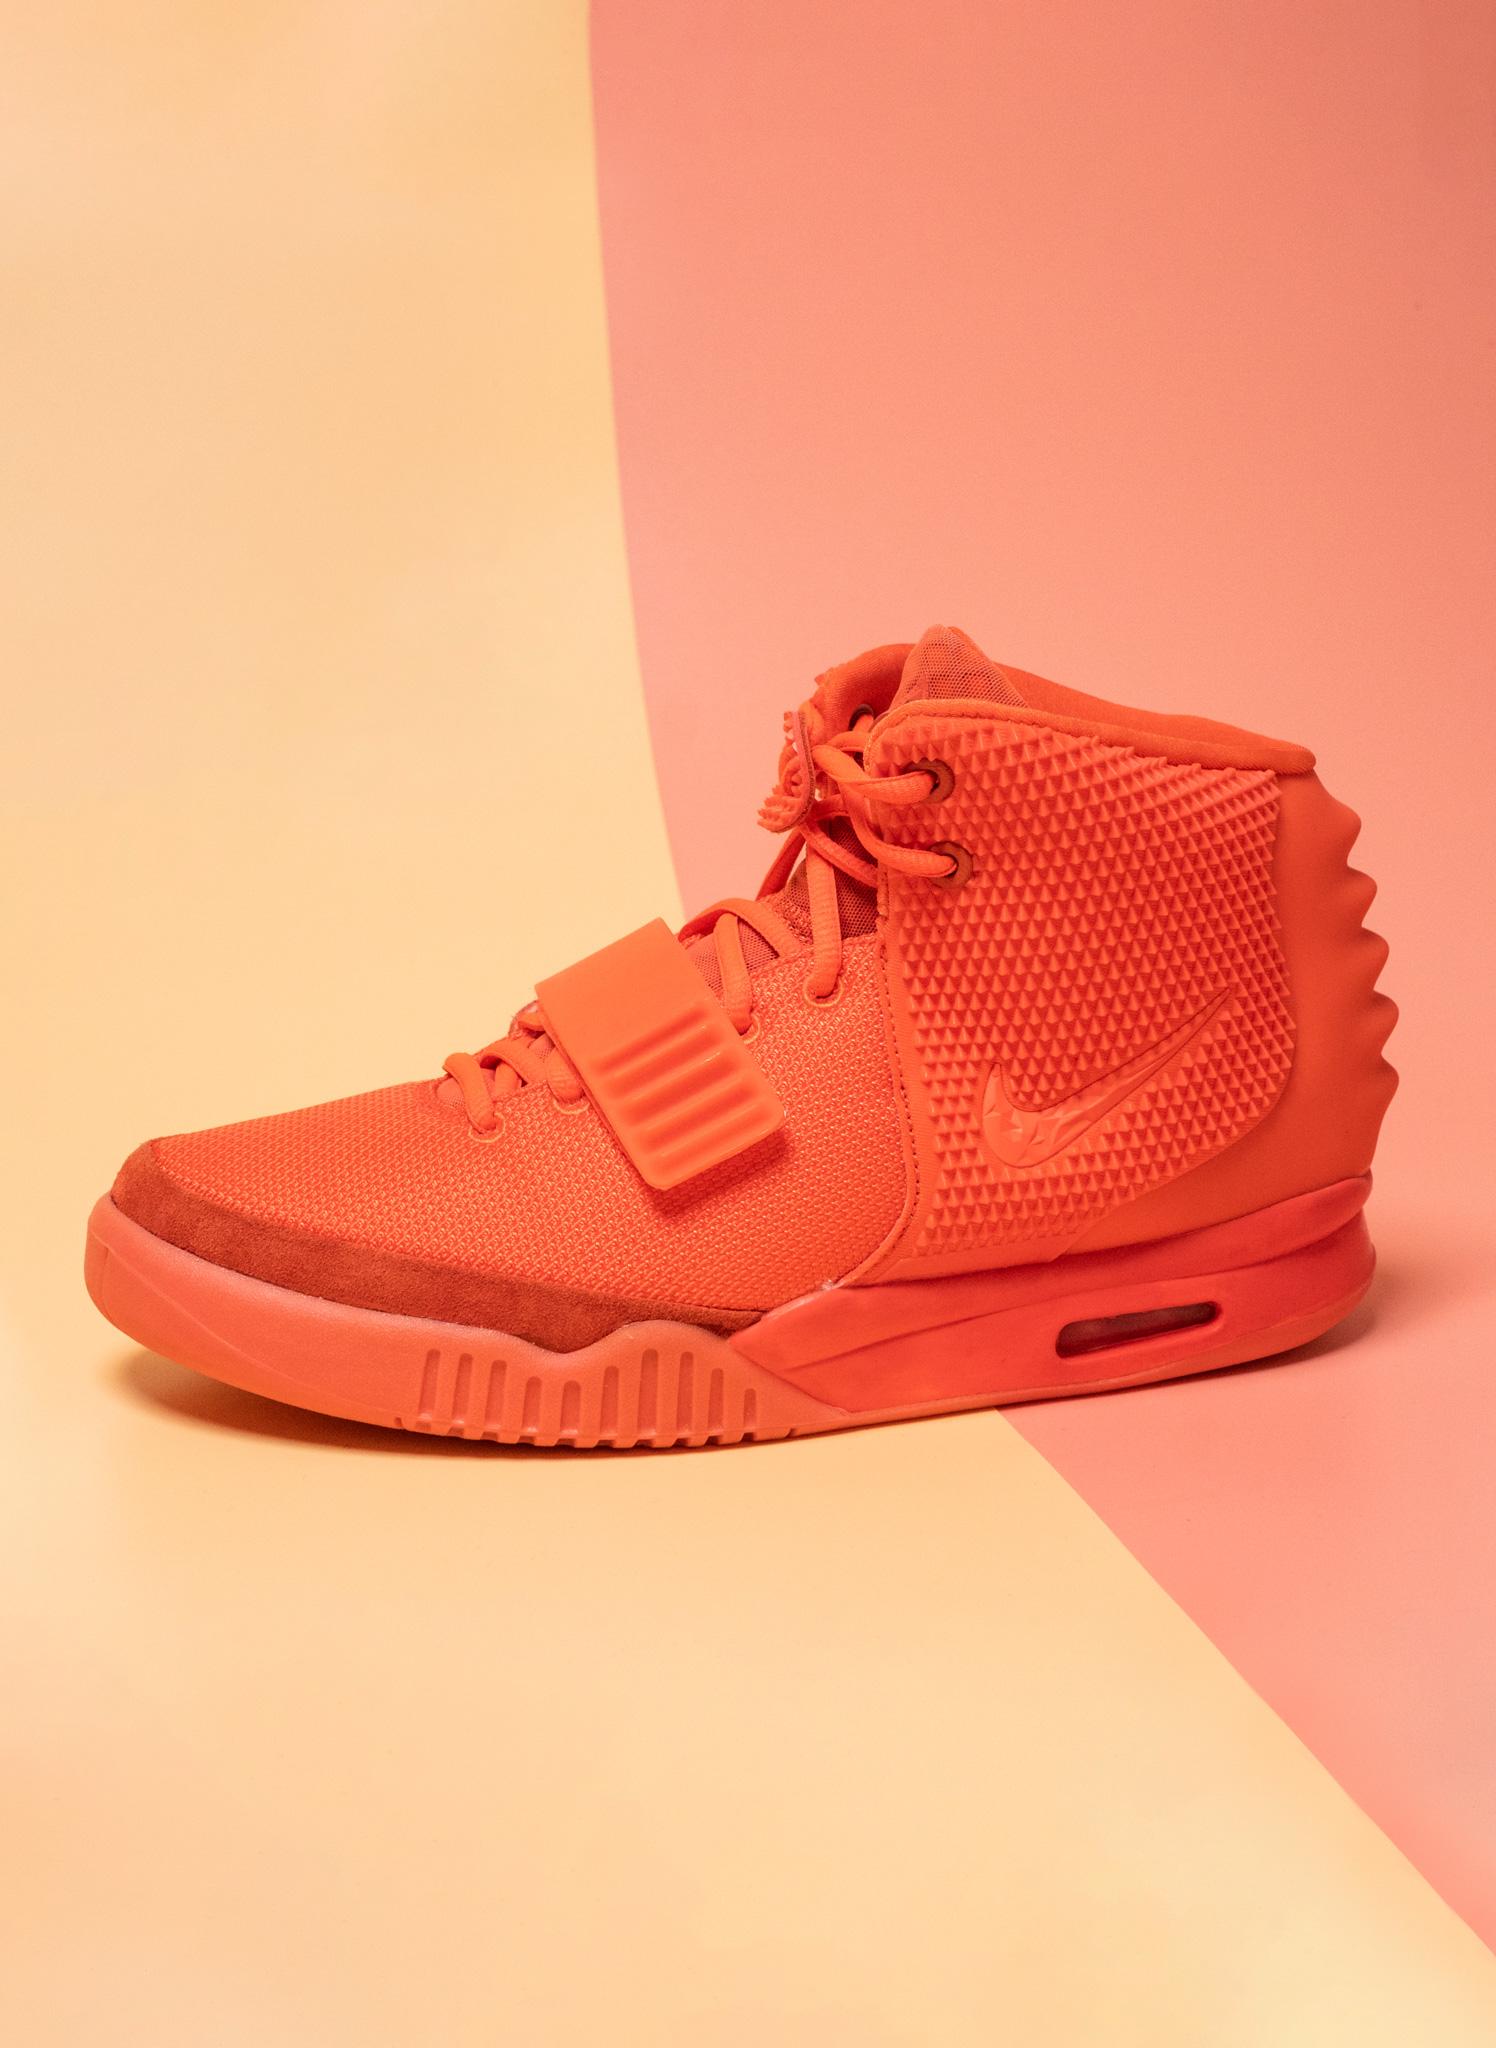 Nike Air Yeezy 2 Red October Mood 3